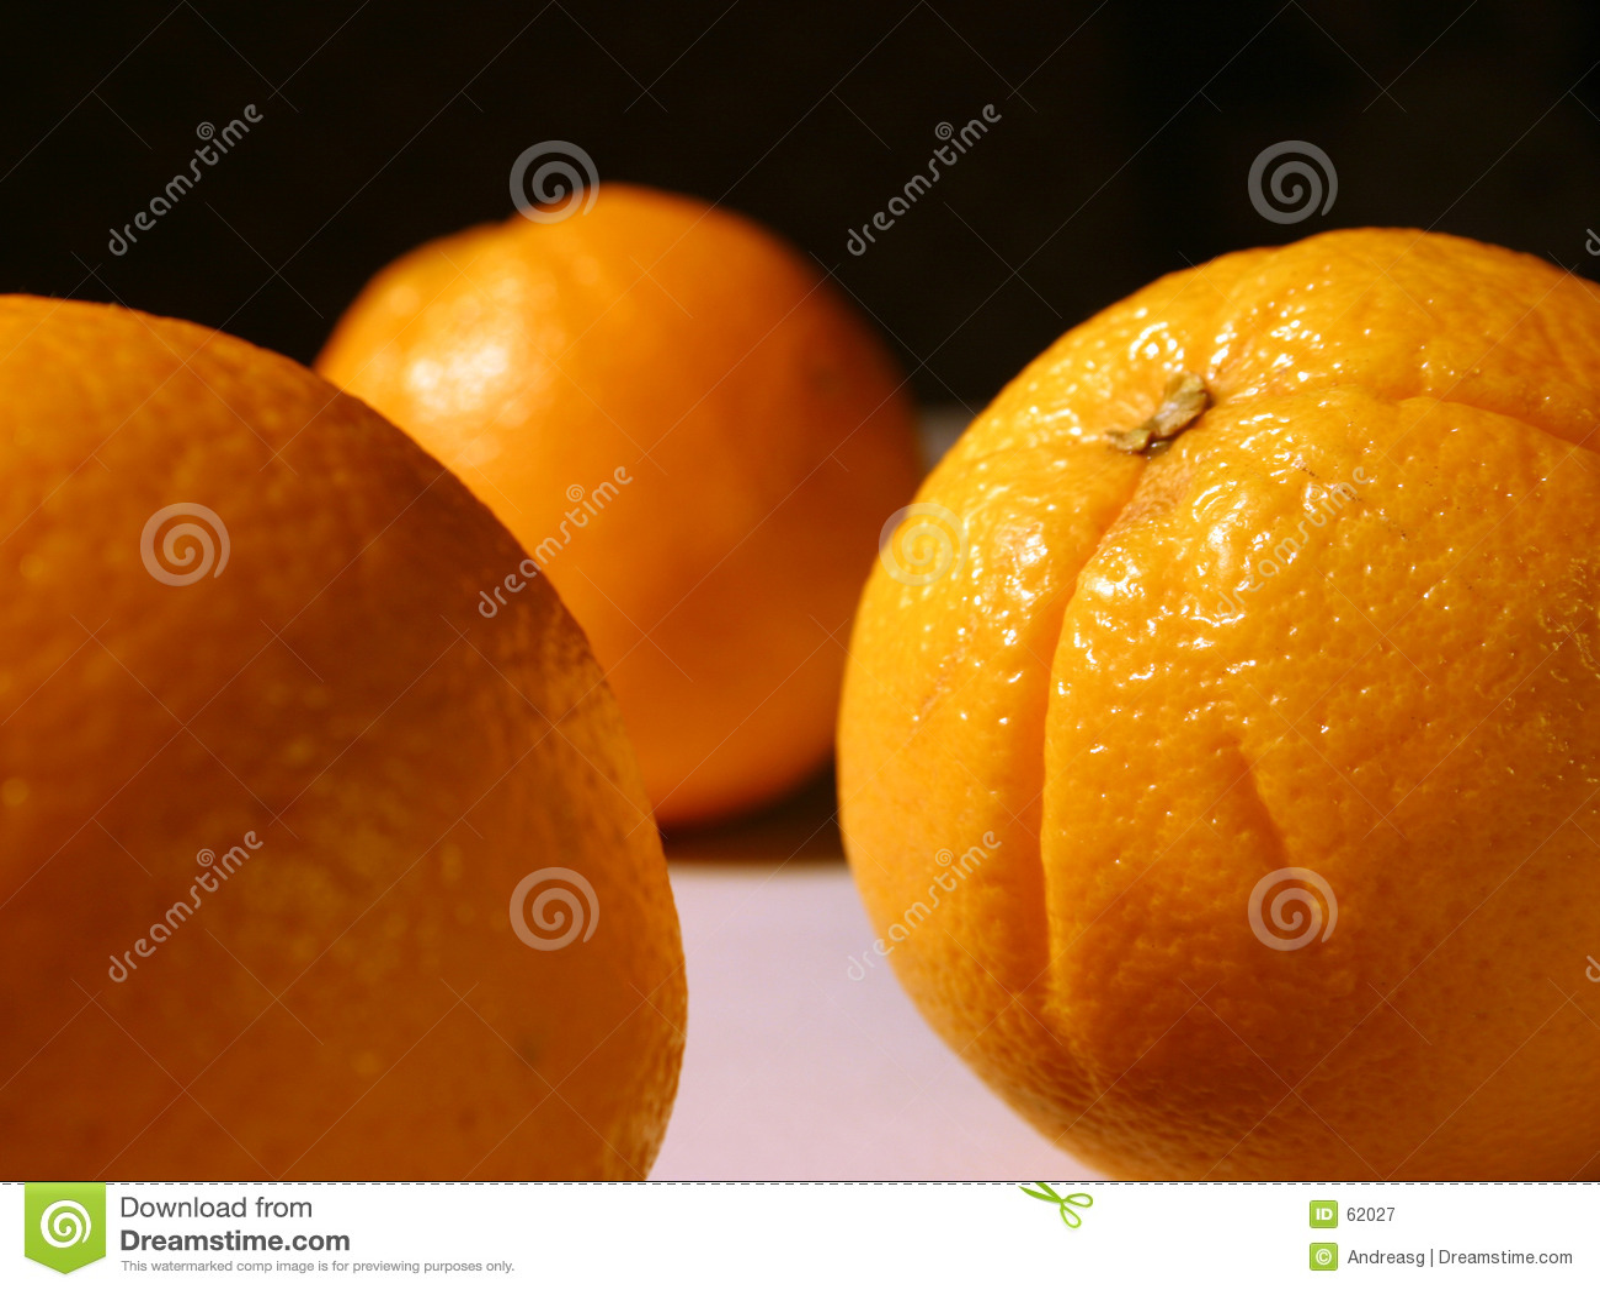 Download πορτοκάλια στοκ εικόνα. εικόνα από πορτοκάλι, φρέσκος, καρπός - 62027